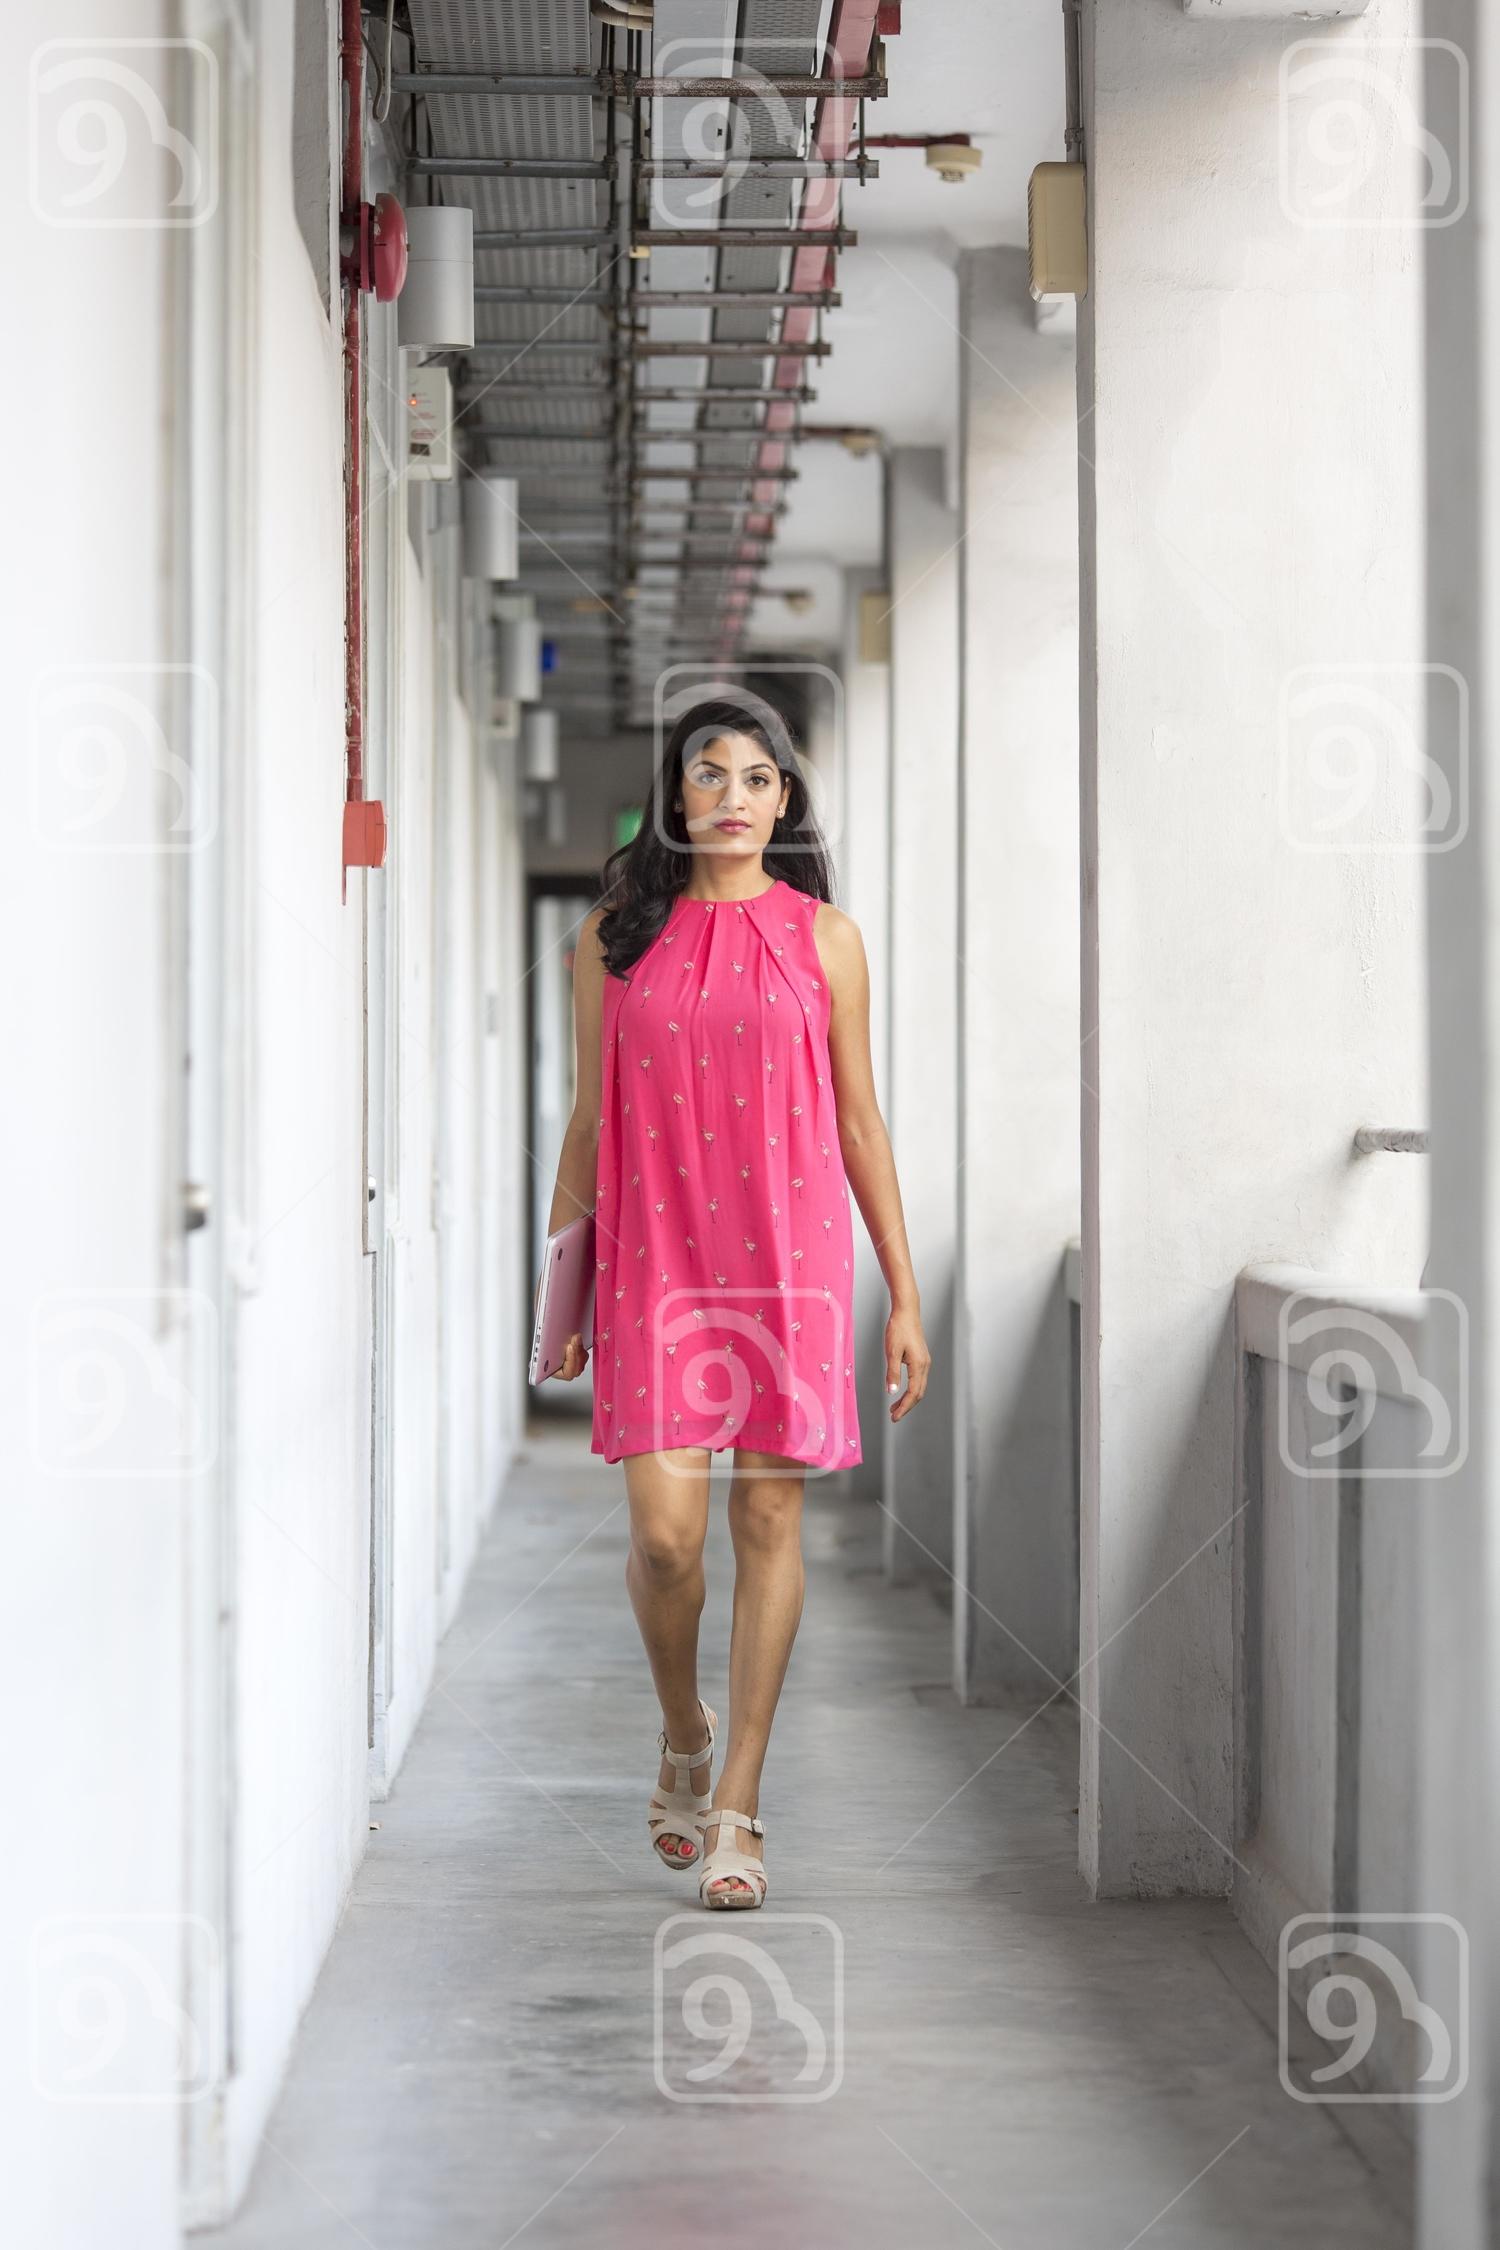 Beautiful Indian lady walking along the corridor